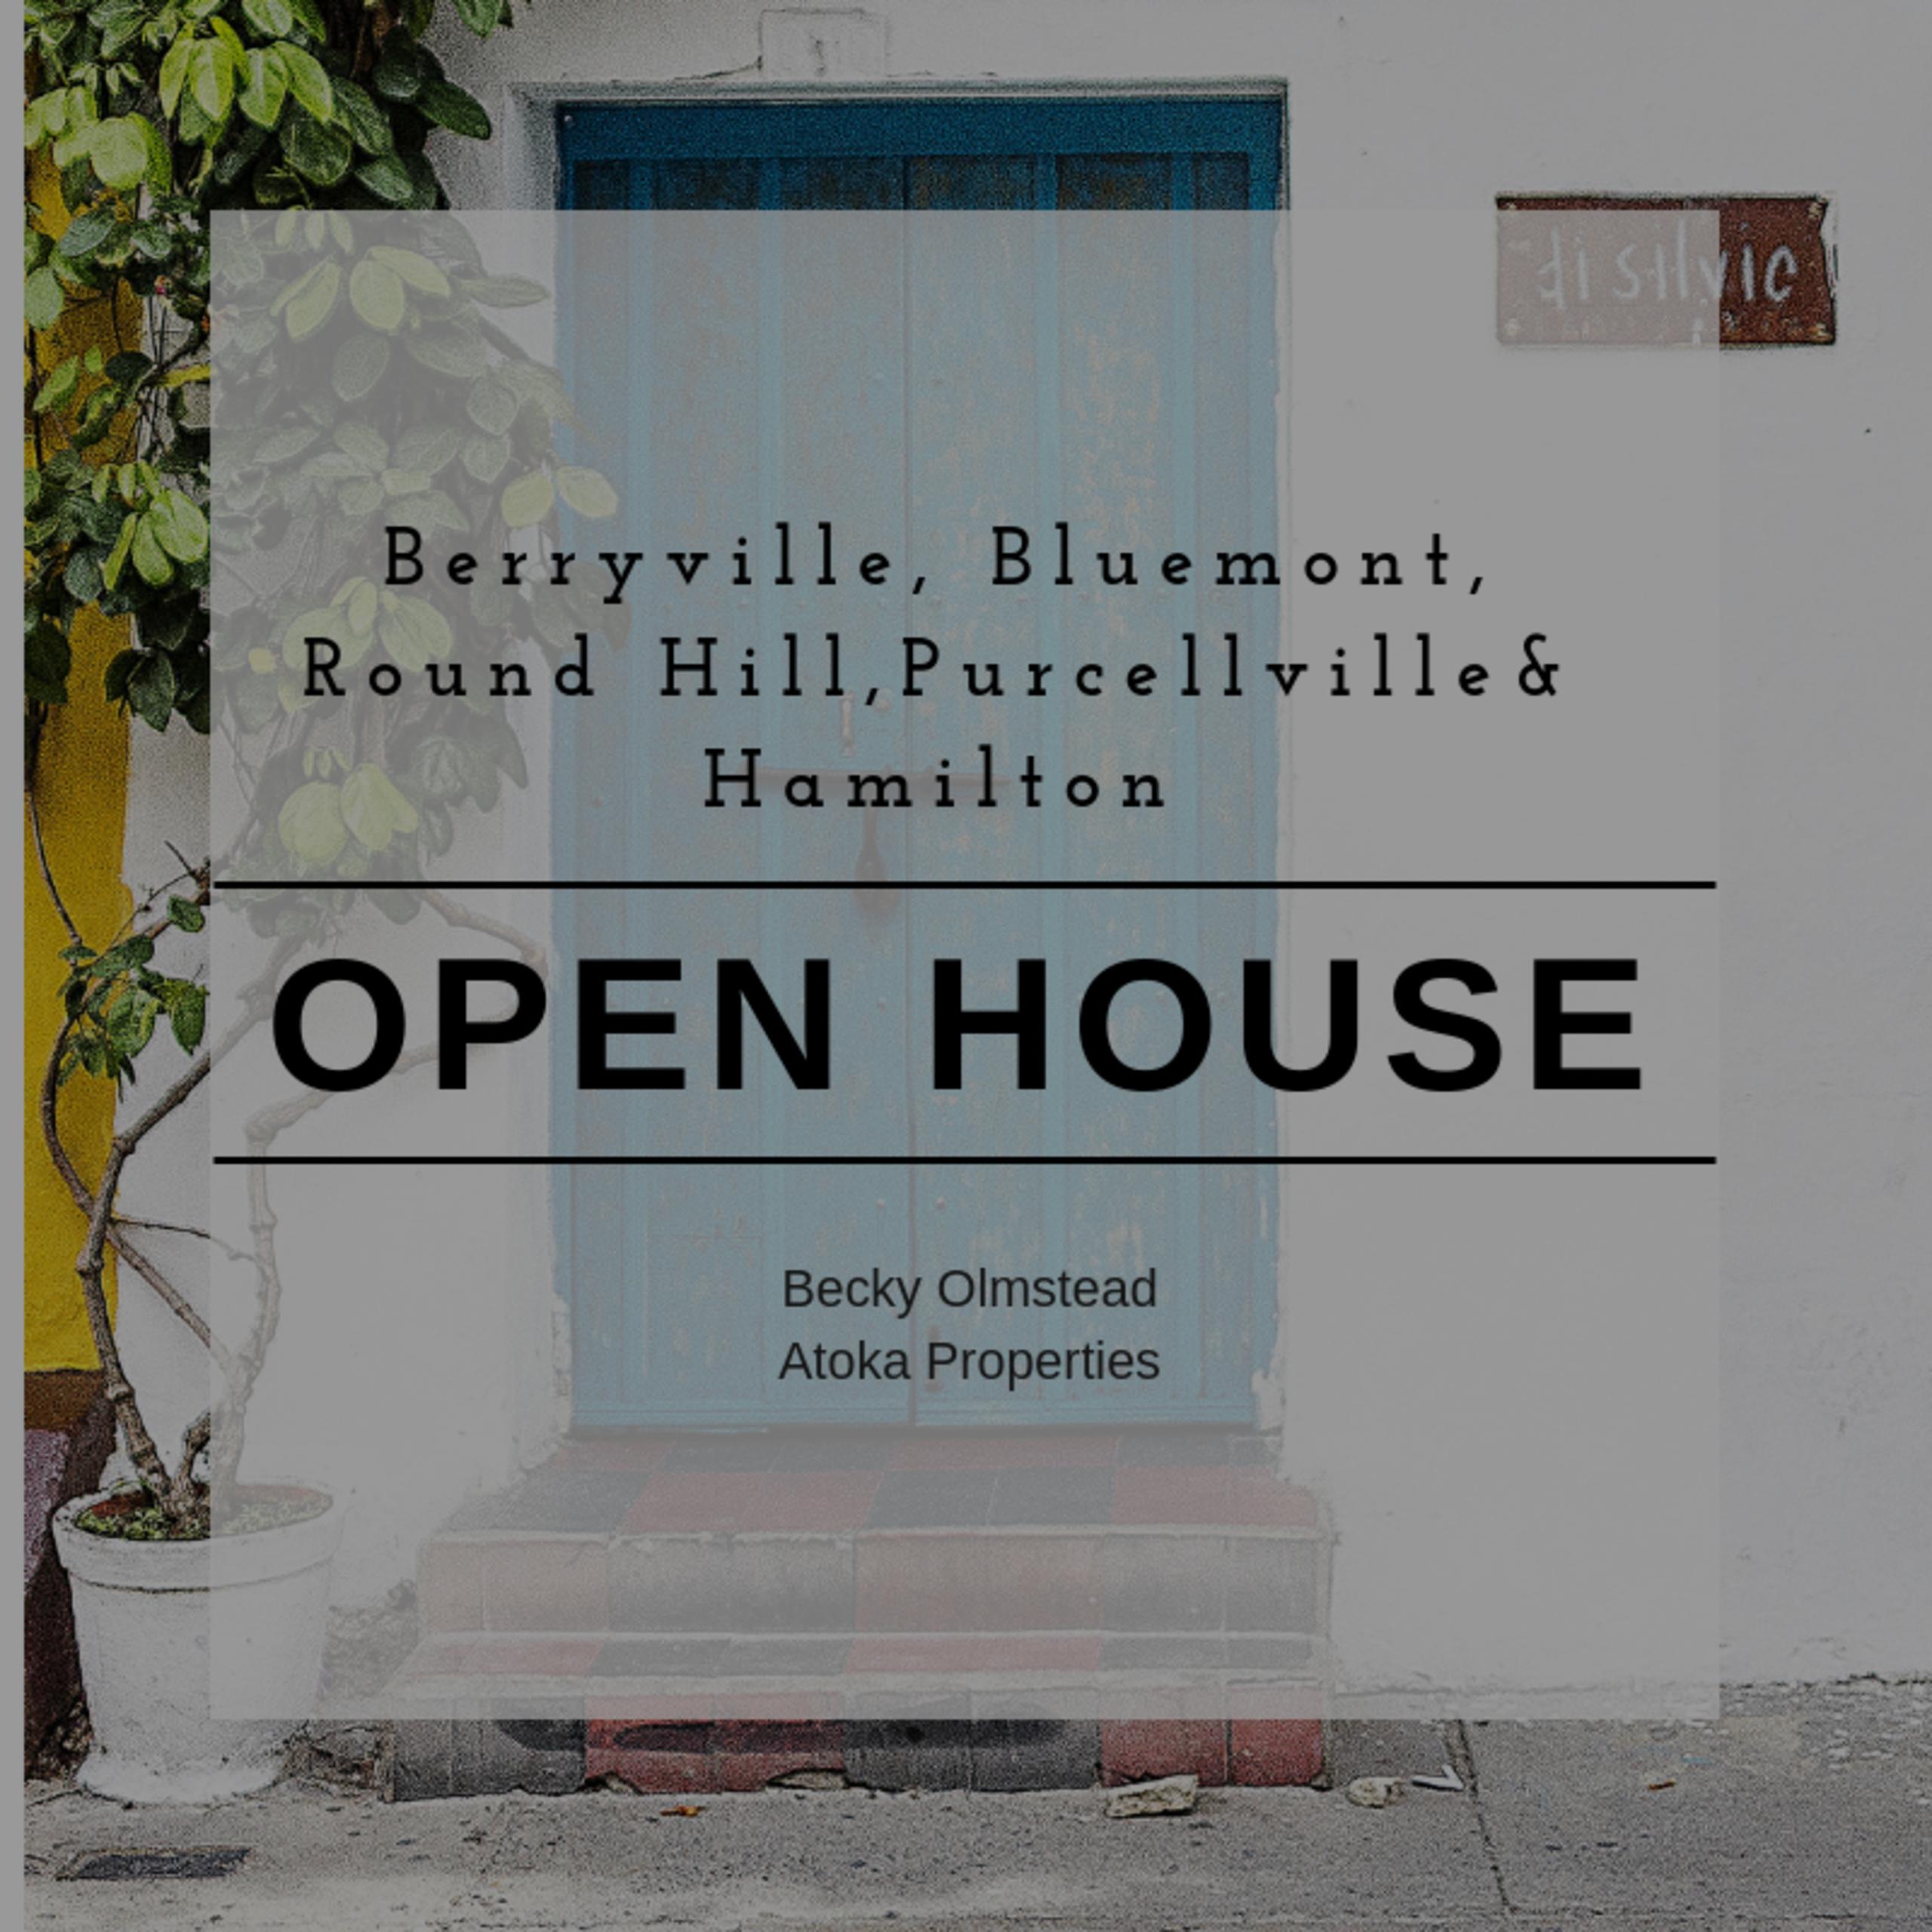 OPEN HOUSE LIST 9/15/18 – 9/16/18